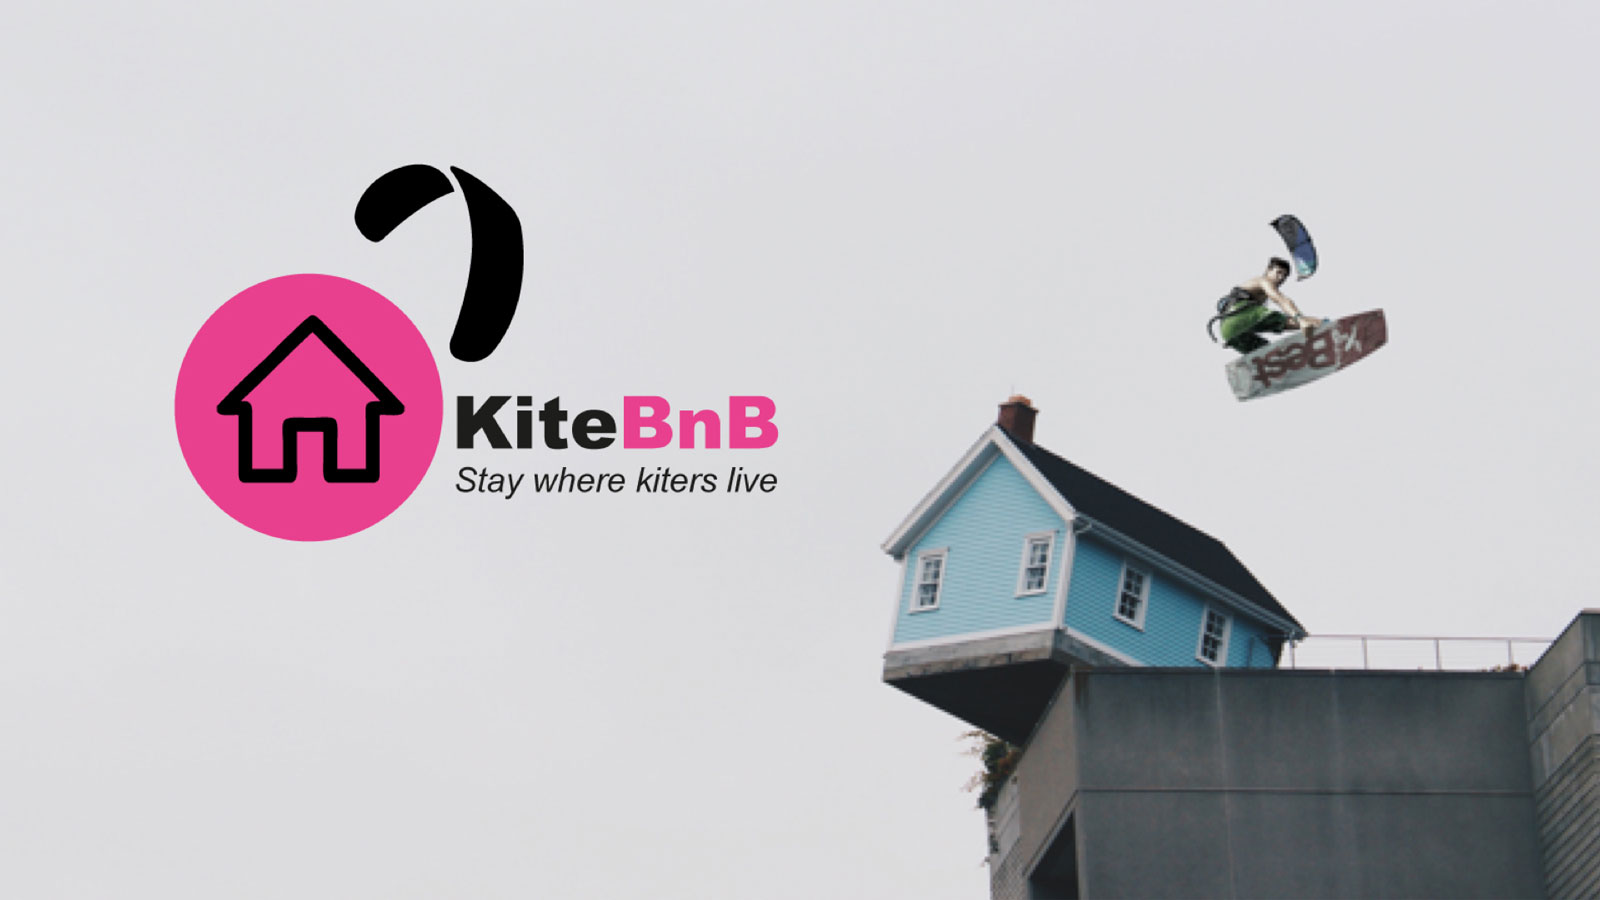 kiteBnB